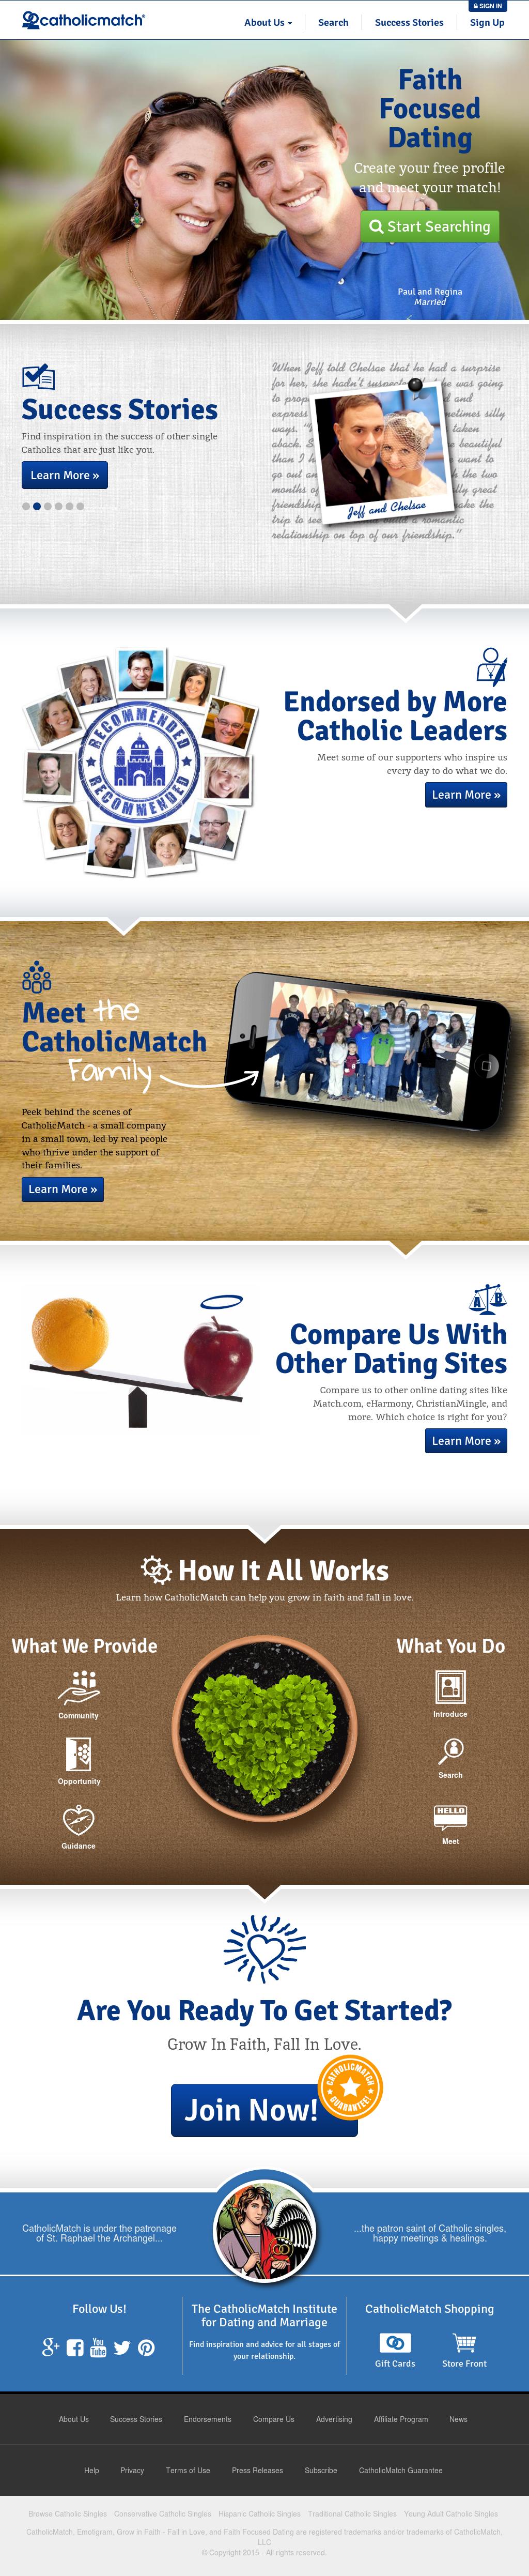 Catholic match com sign in